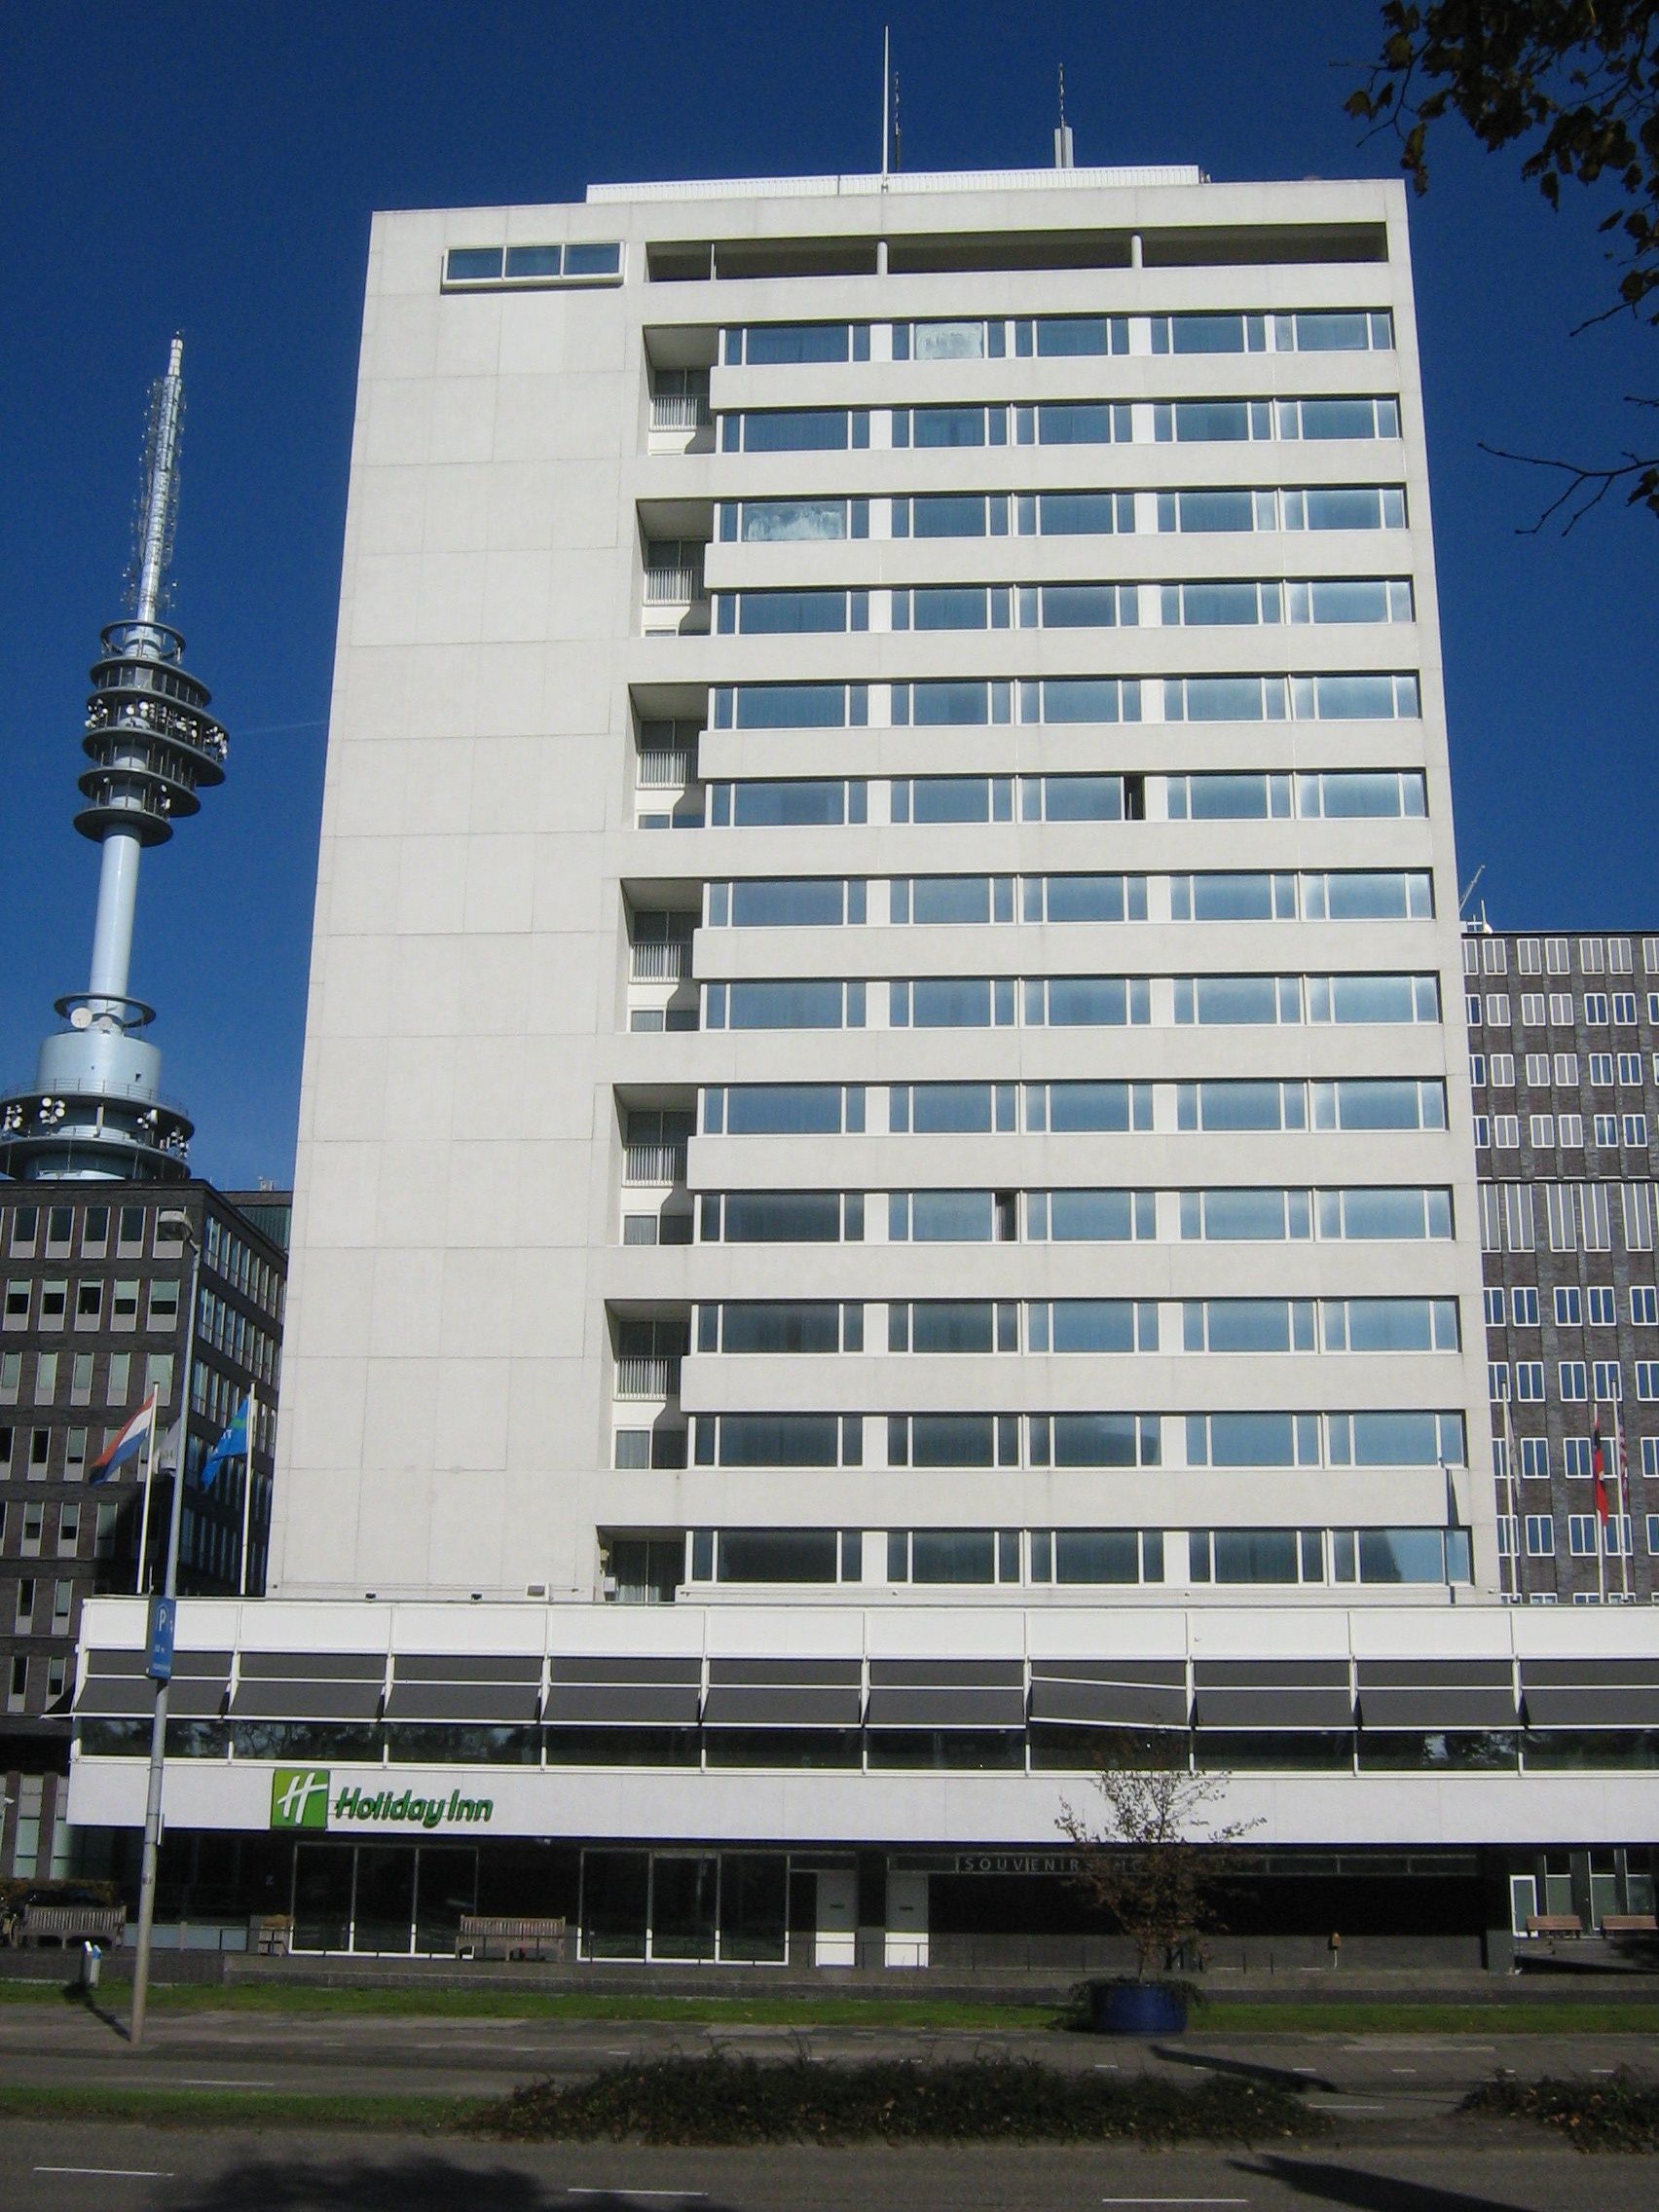 Hotel Buitenveldert Amsterdam